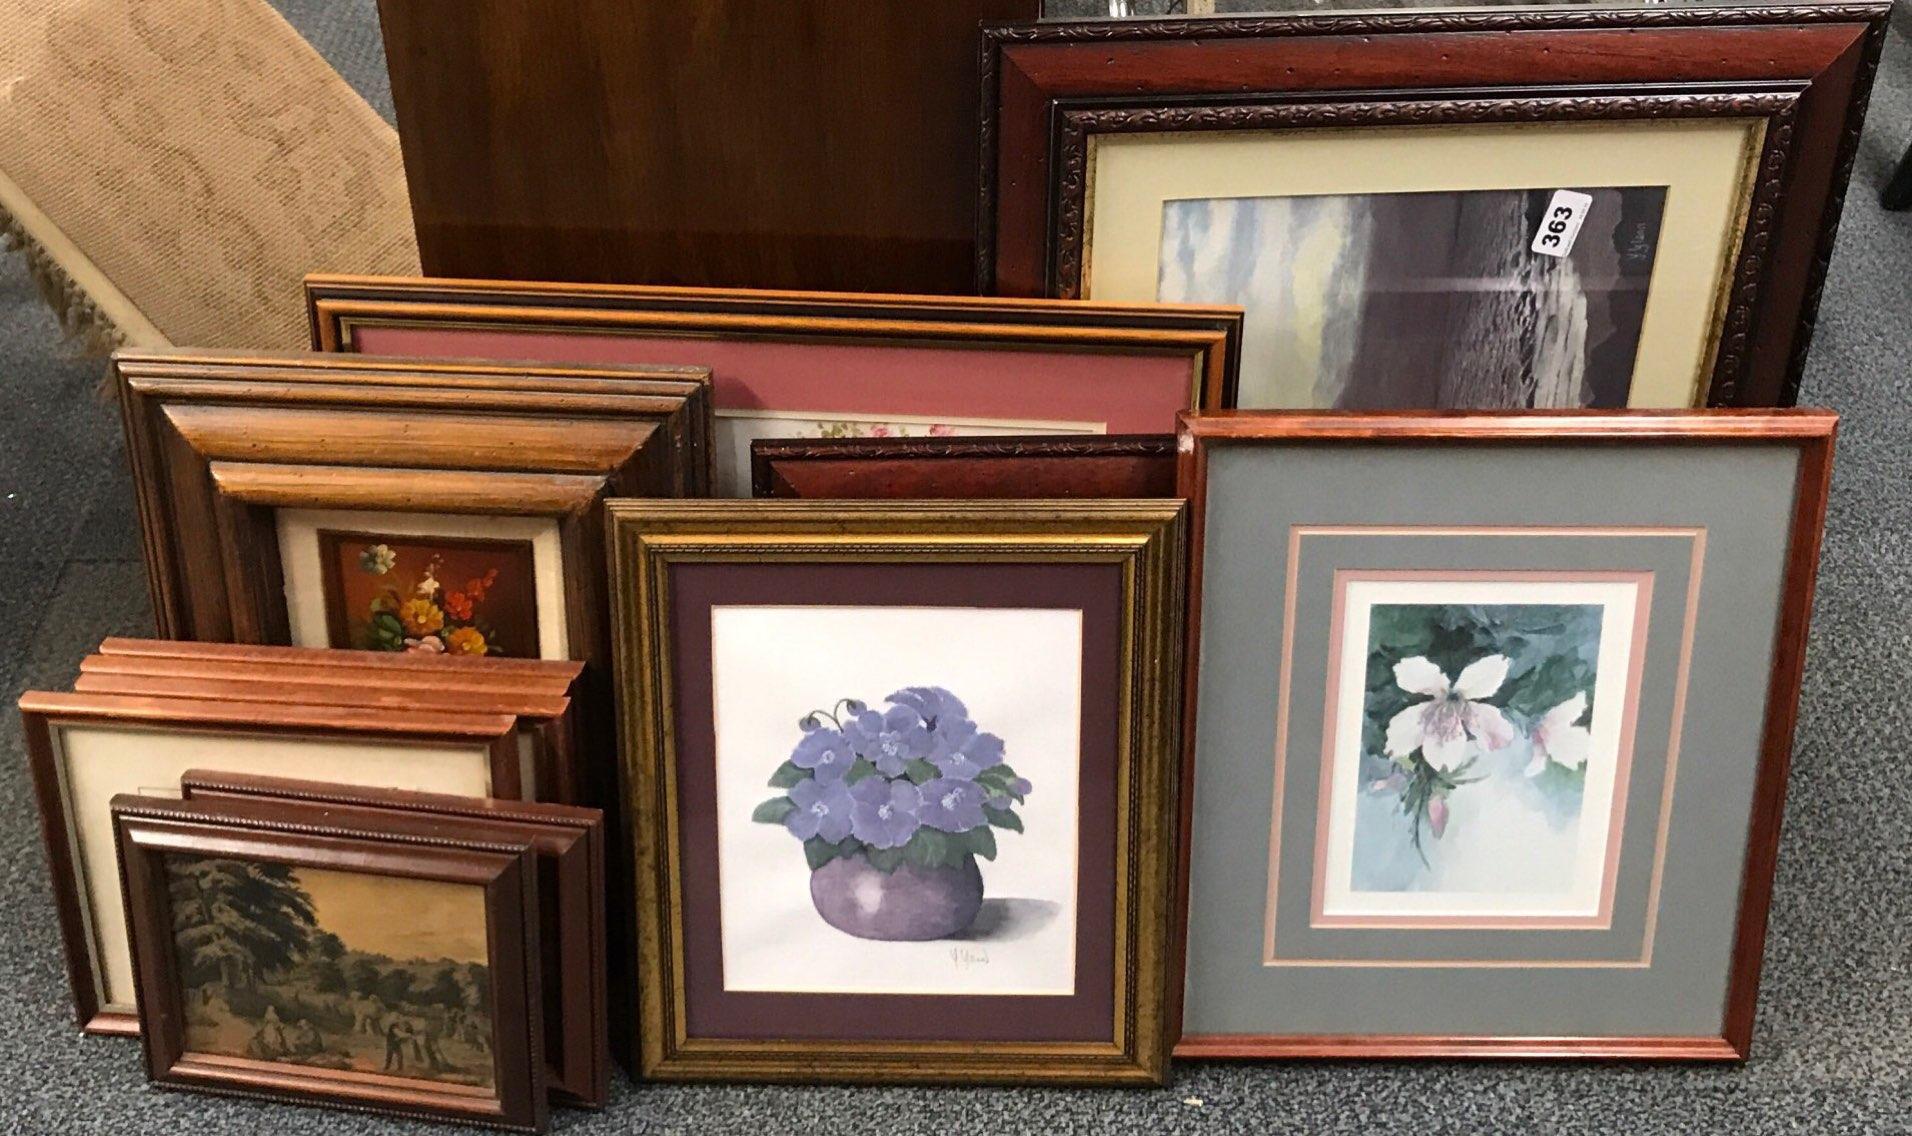 Lot 363 - A quantity of framed prints.